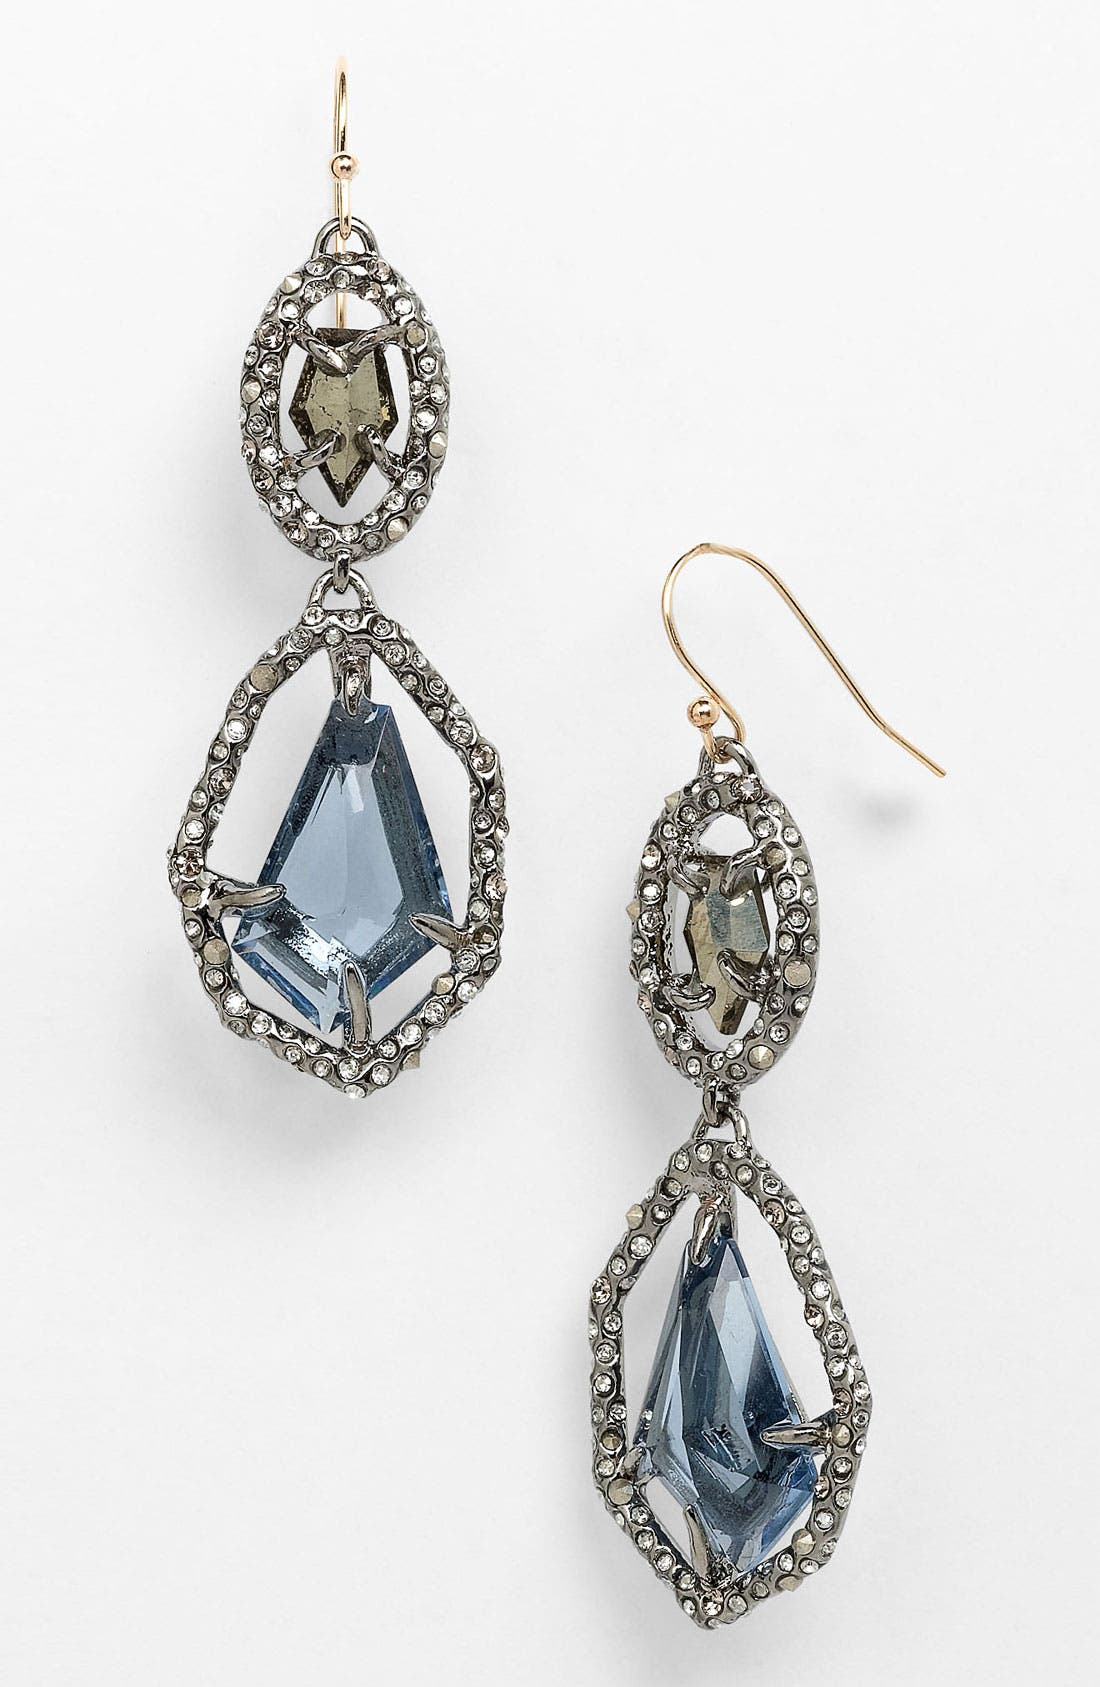 Main Image - Alexis Bittar 'Miss Havisham - Delano' Deco Drop Earrings (Nordstrom Exclusive)